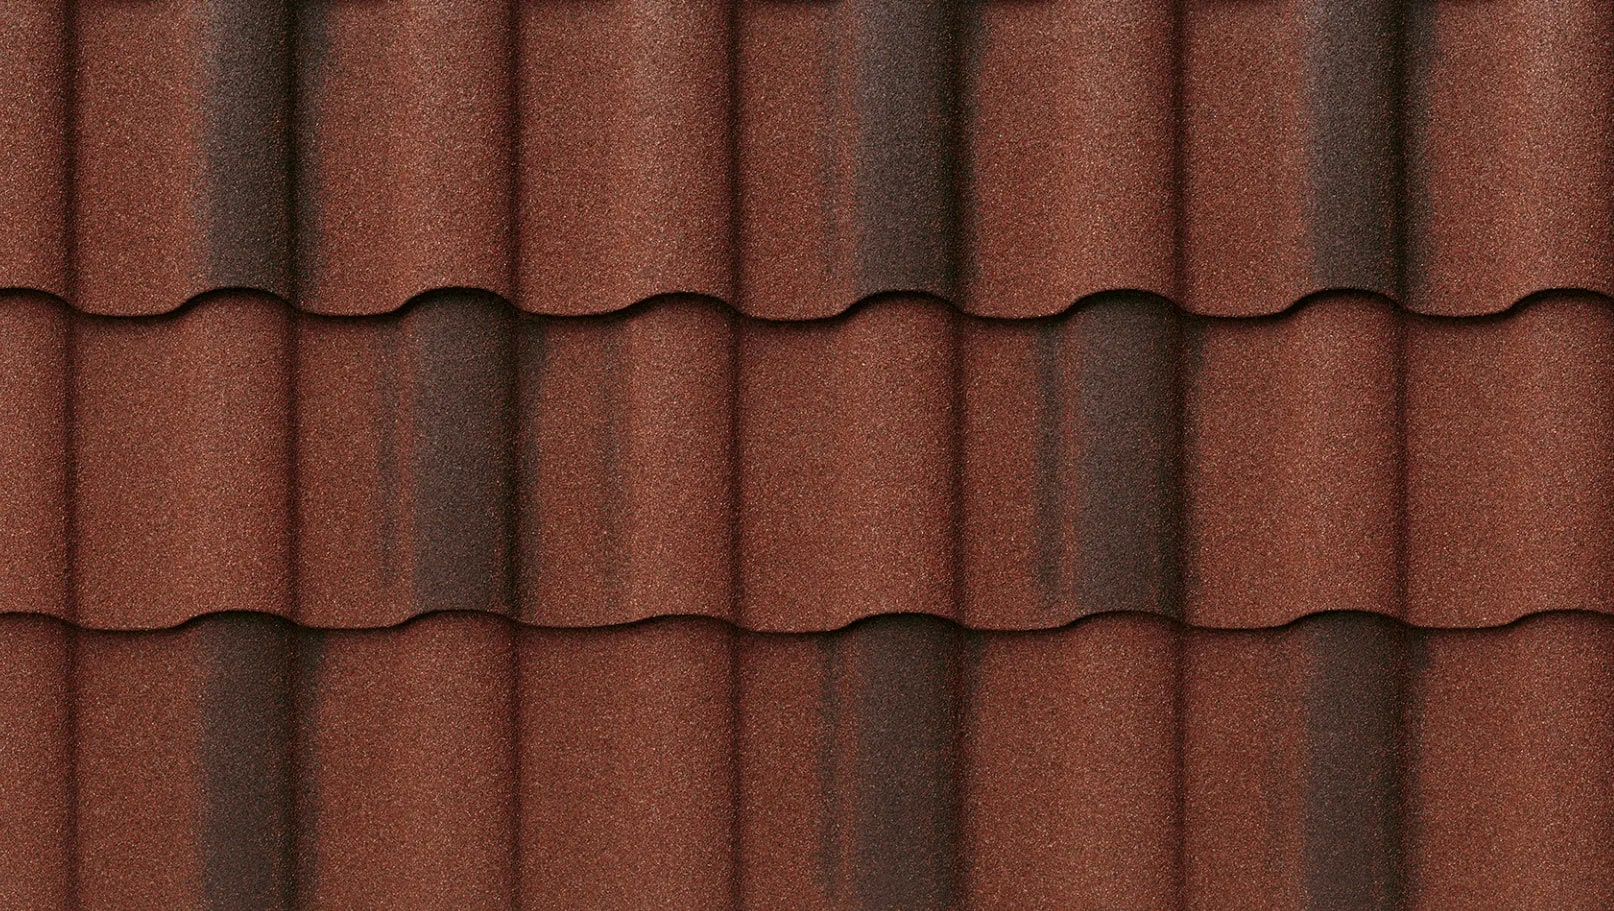 villa-tile-pattern4-max-min